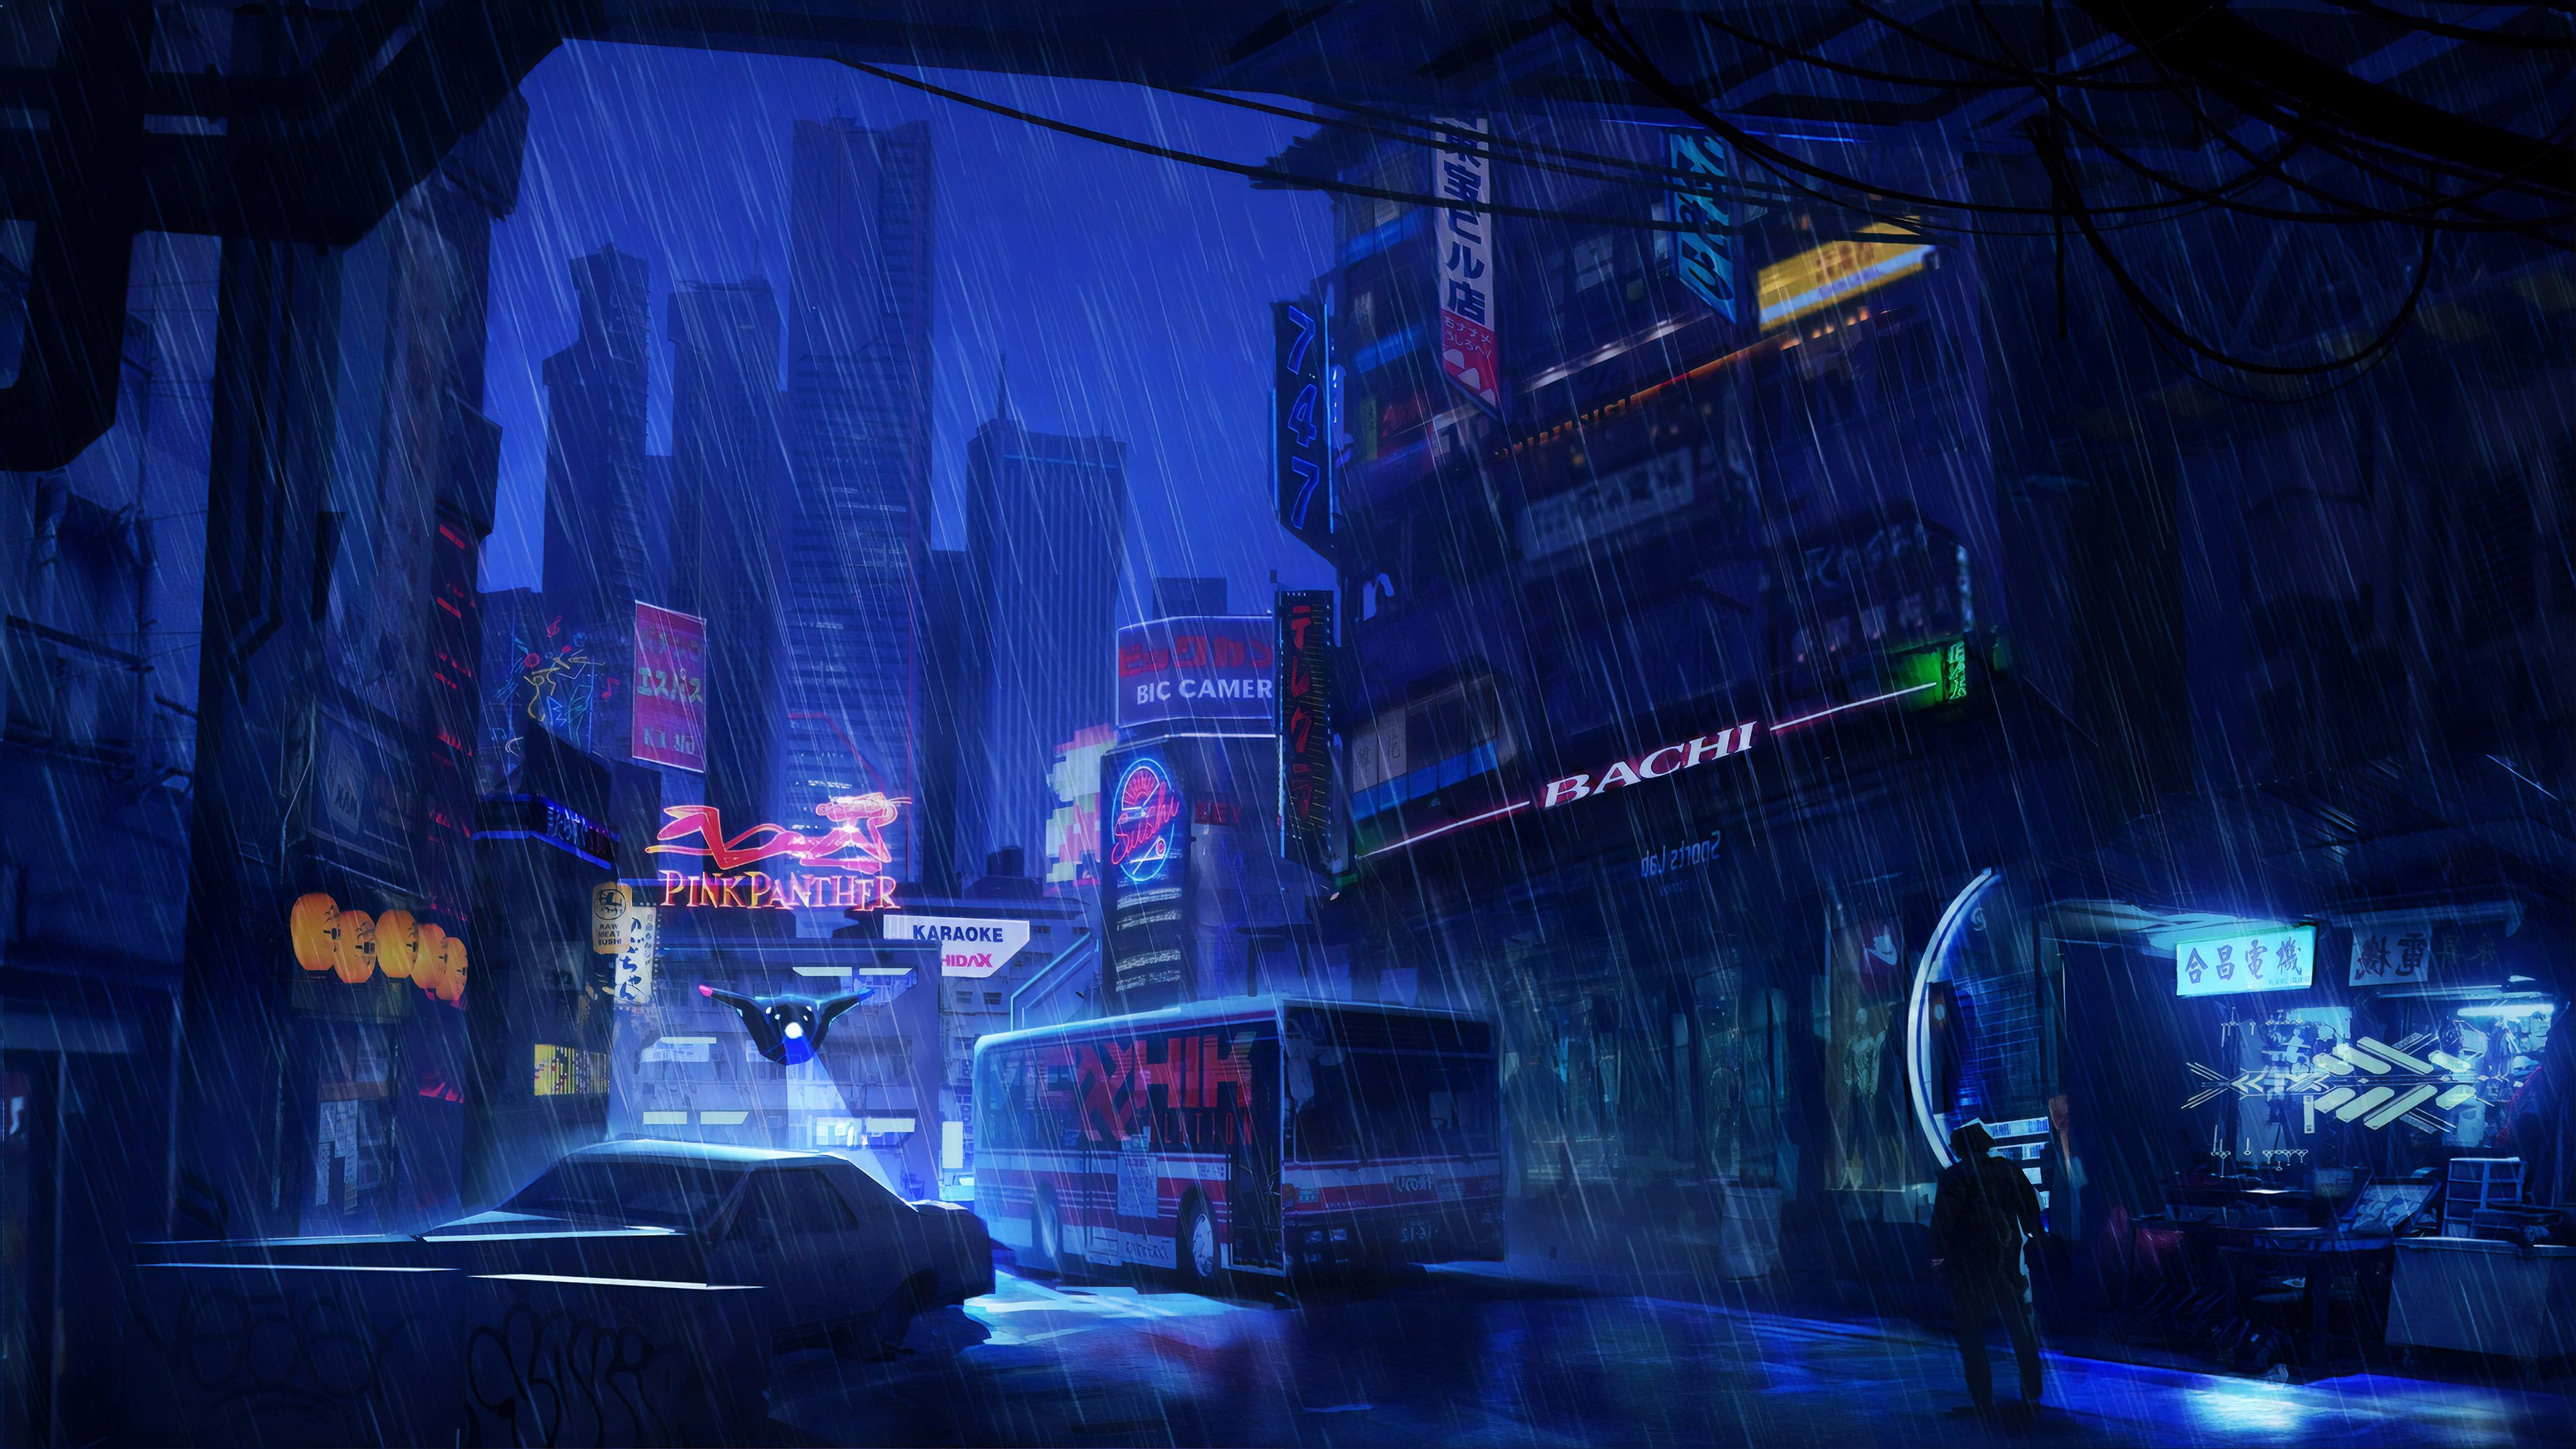 Sci Fi City Cyberpunk Night Rain Skyscraper 4k Wallpaper Hdwallpaper Deskto Computer Wallpaper Desktop Wallpapers Cyberpunk City Desktop Wallpaper Art